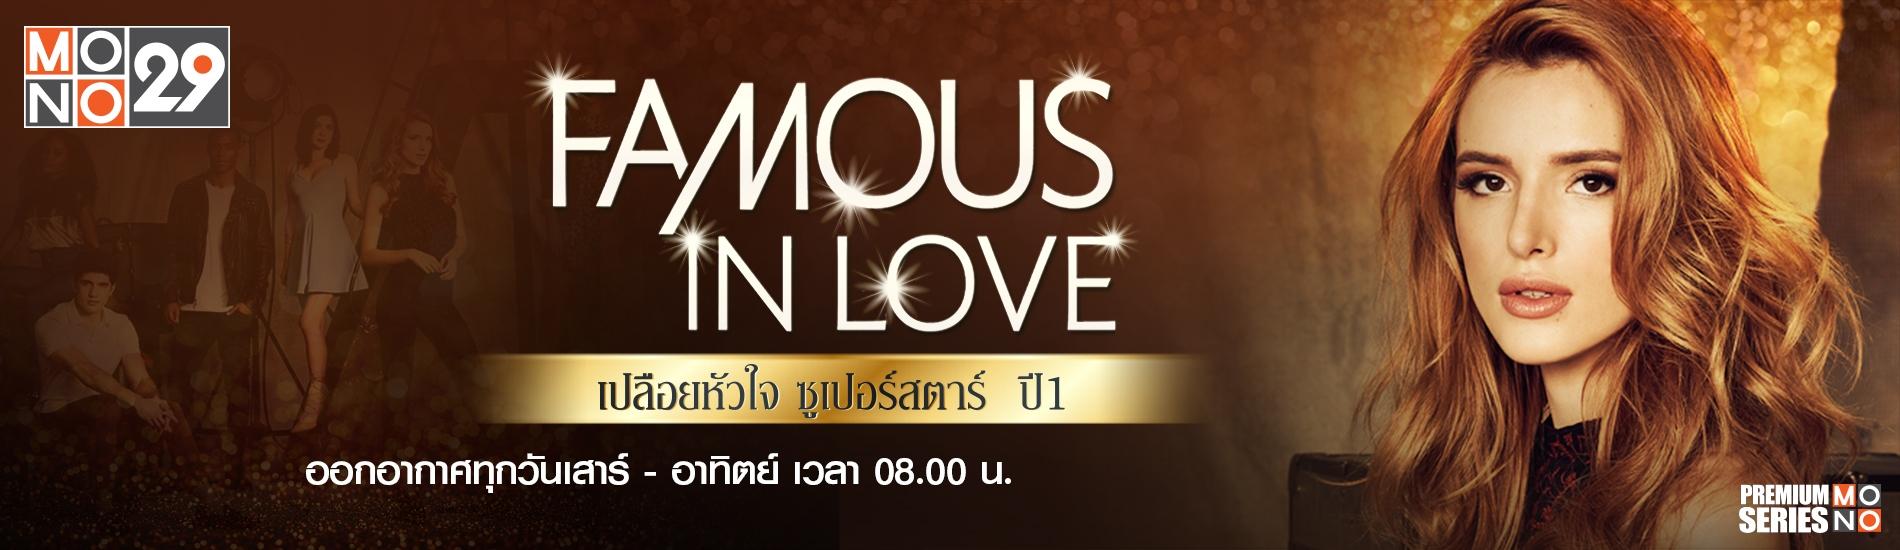 Famous In Love เปลือยหัวใจ ซูเปอร์สตาร์ ปี 1